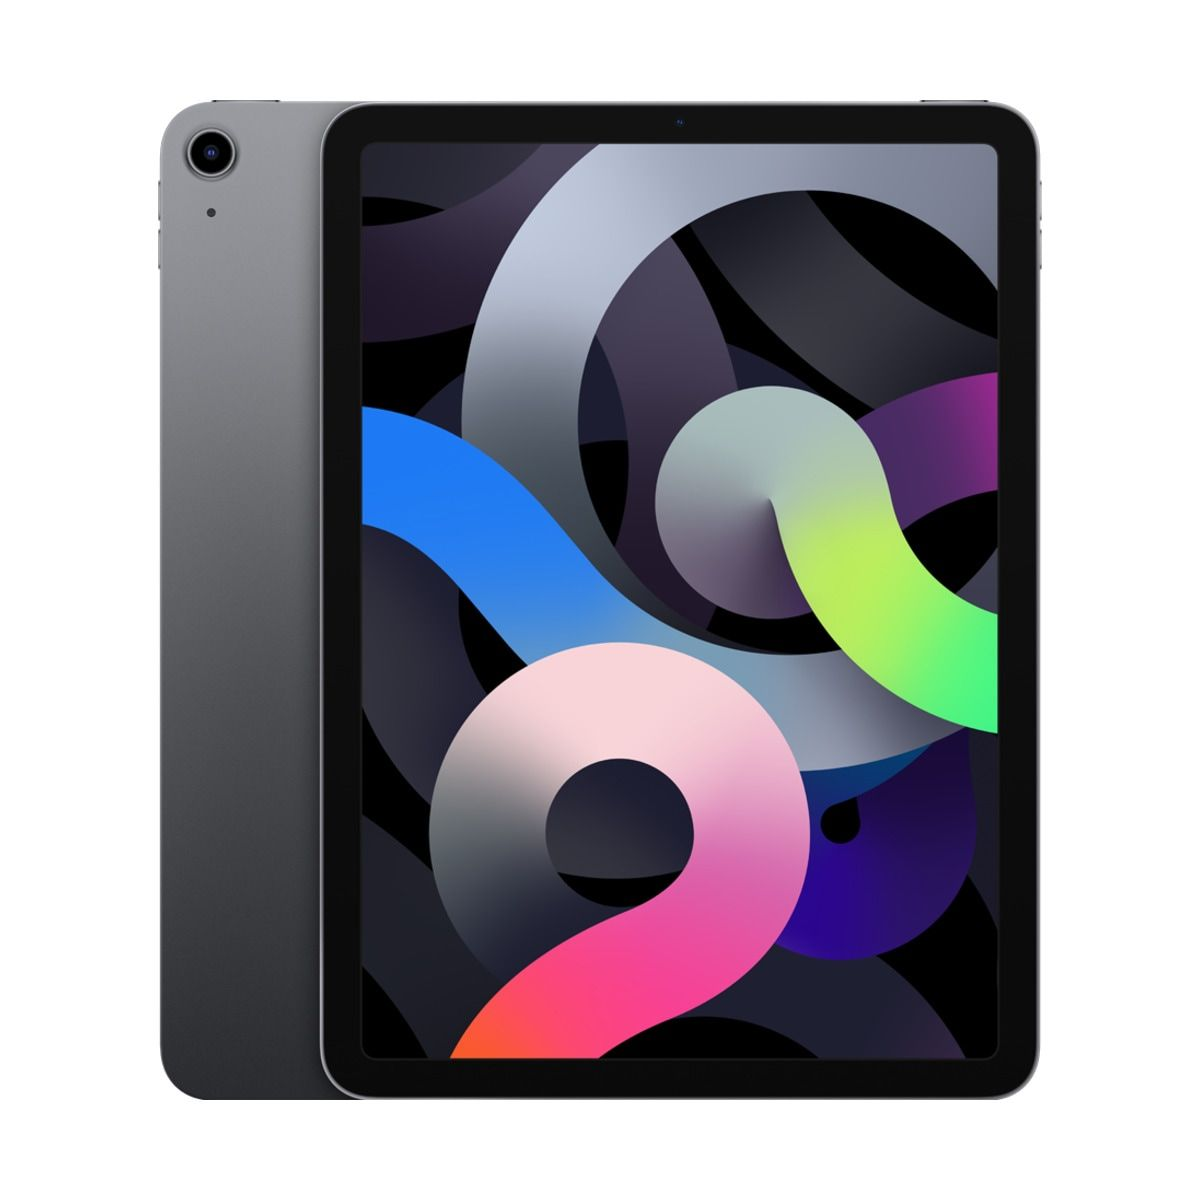 Apple iPad Air Wi-Fi + Cell 64GB - Space Grey / SK